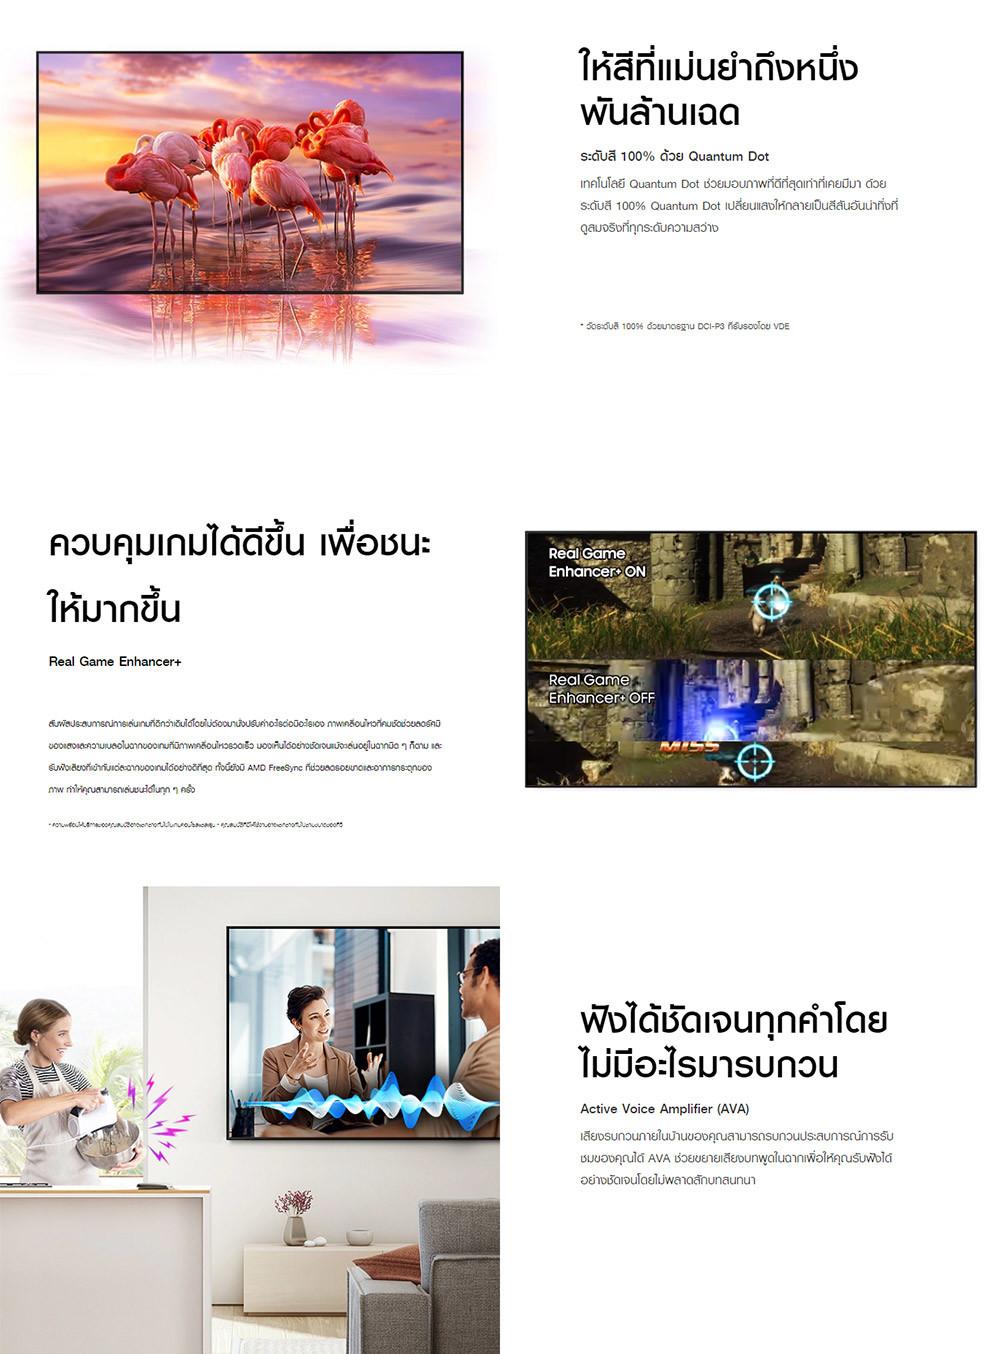 content-image_5.jpg